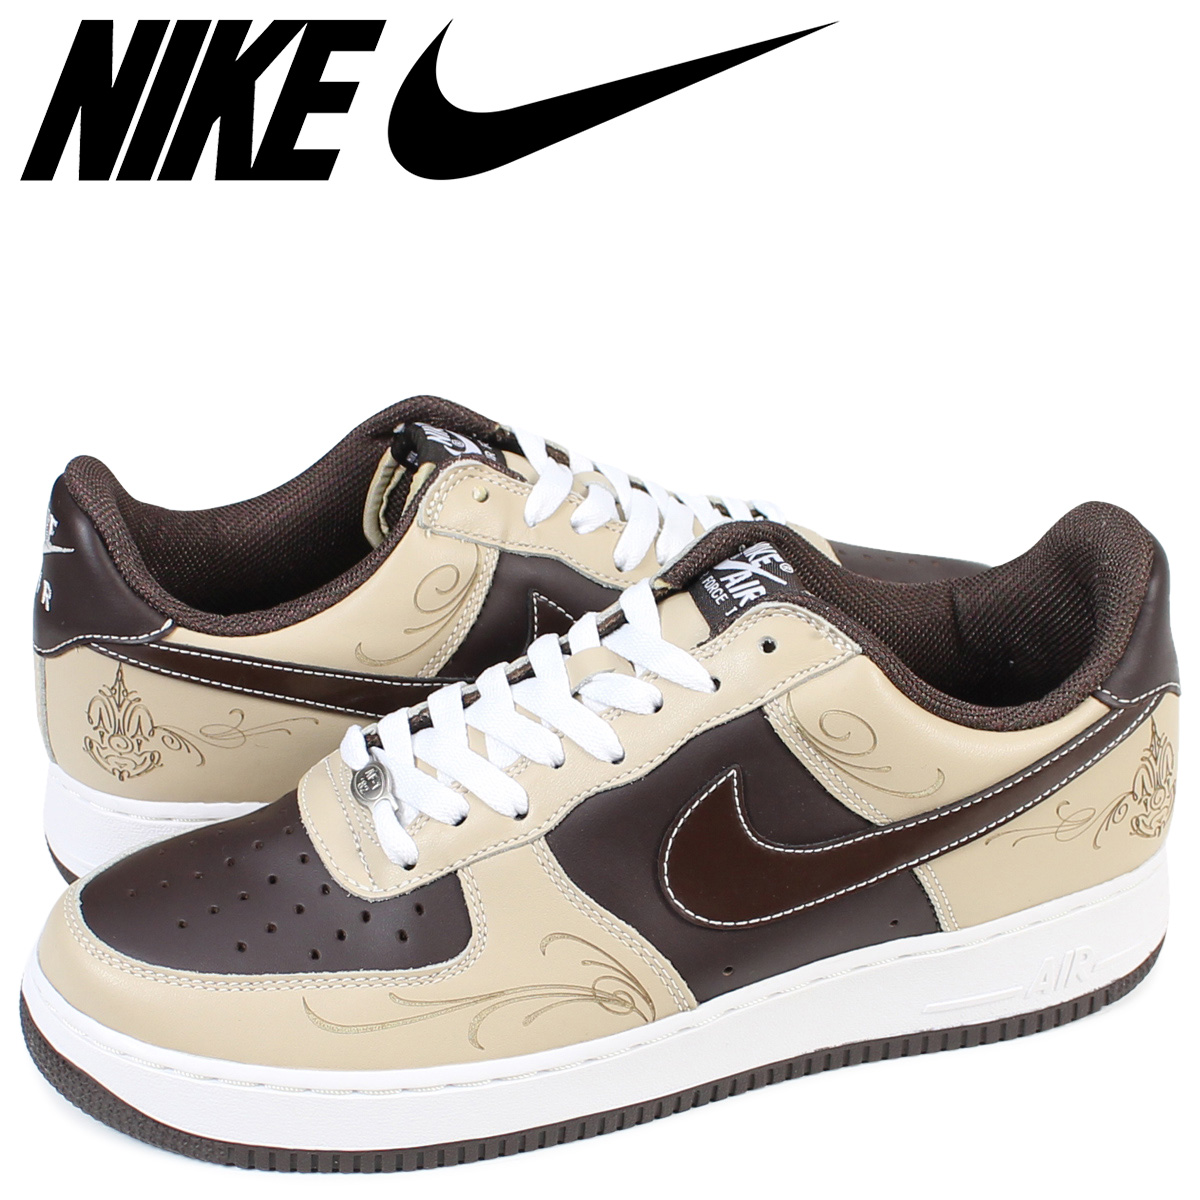 new concept 809ea 6b443 ALLSPORTS NIKE AIR FORCE 1 MR CARTOON Nike air force 1 sneakers  307,334-221 mens shoes brown 1711  Rakuten Global Market